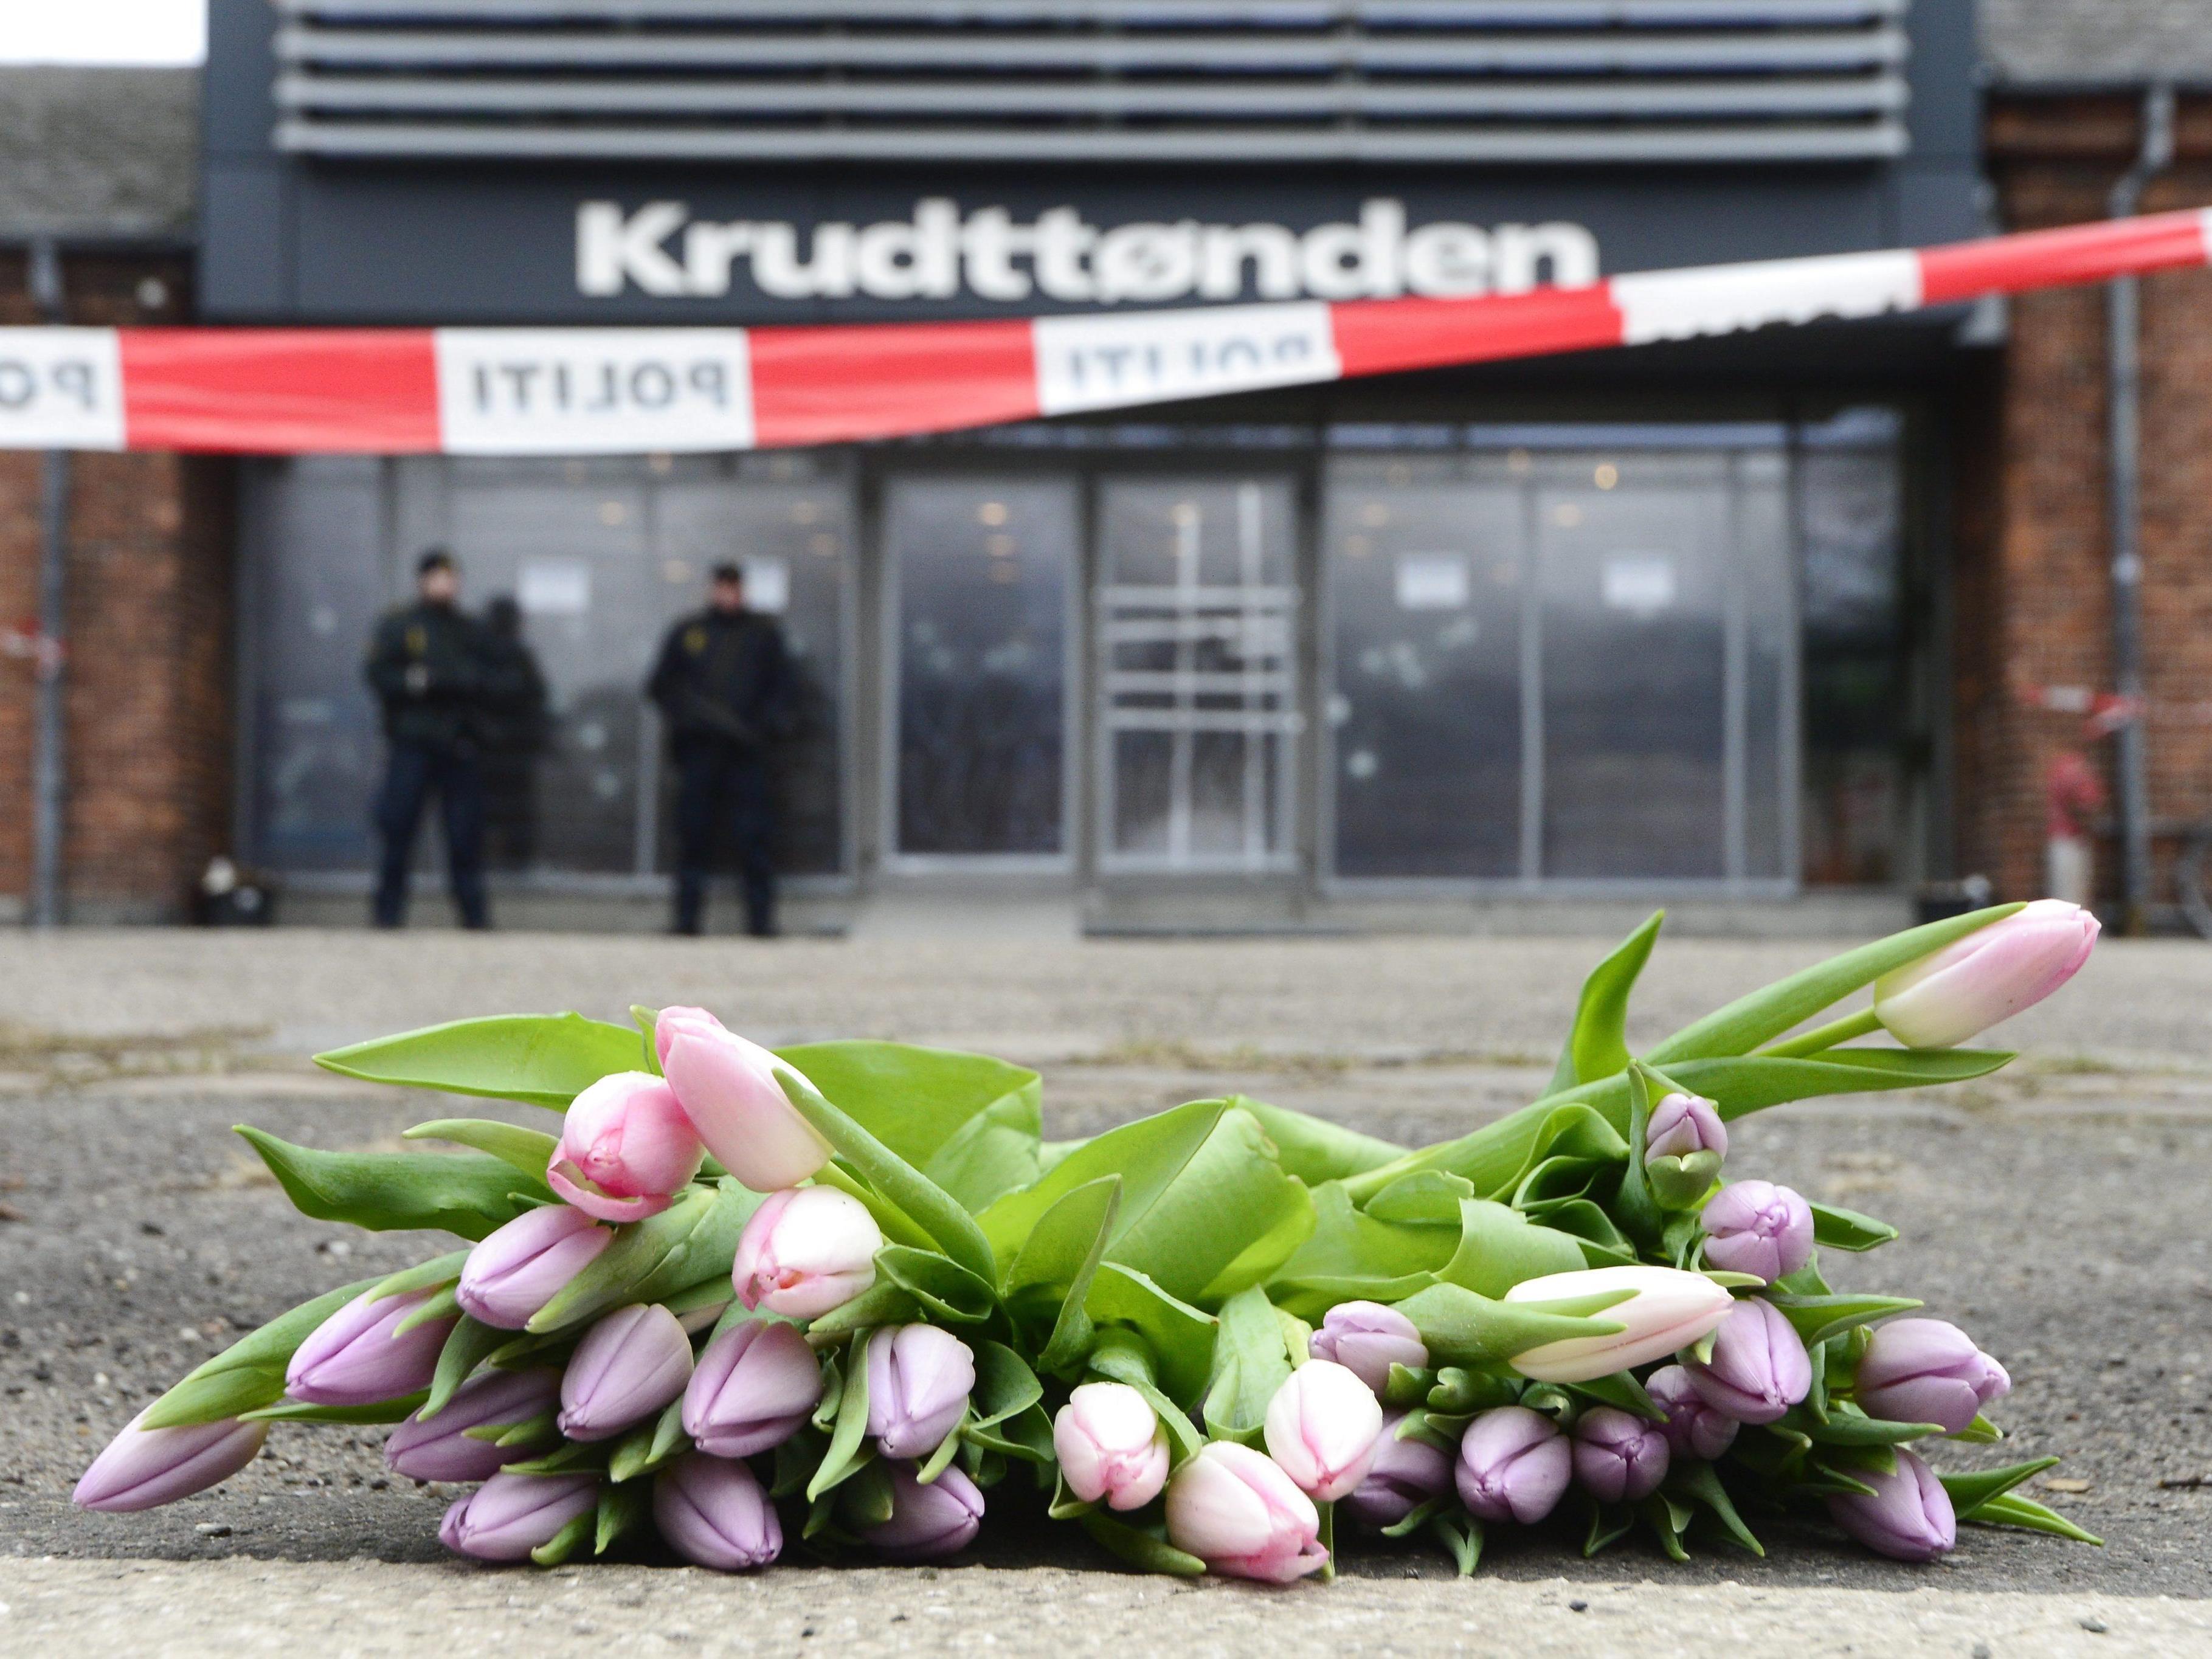 Dänen gedenken der Terroropfer in Kopenhagen.